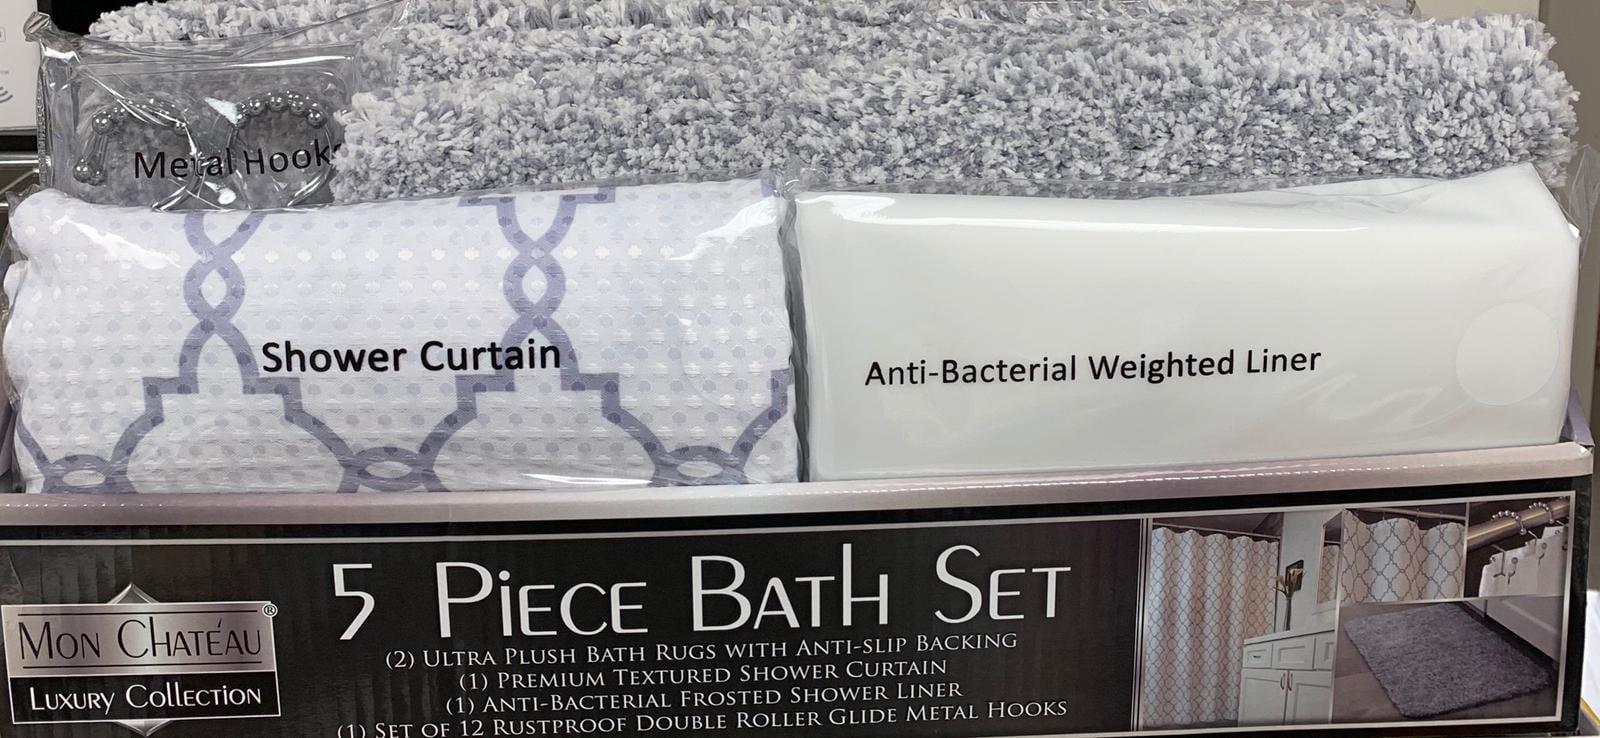 Mon Chateau 5 Piece Bath Set